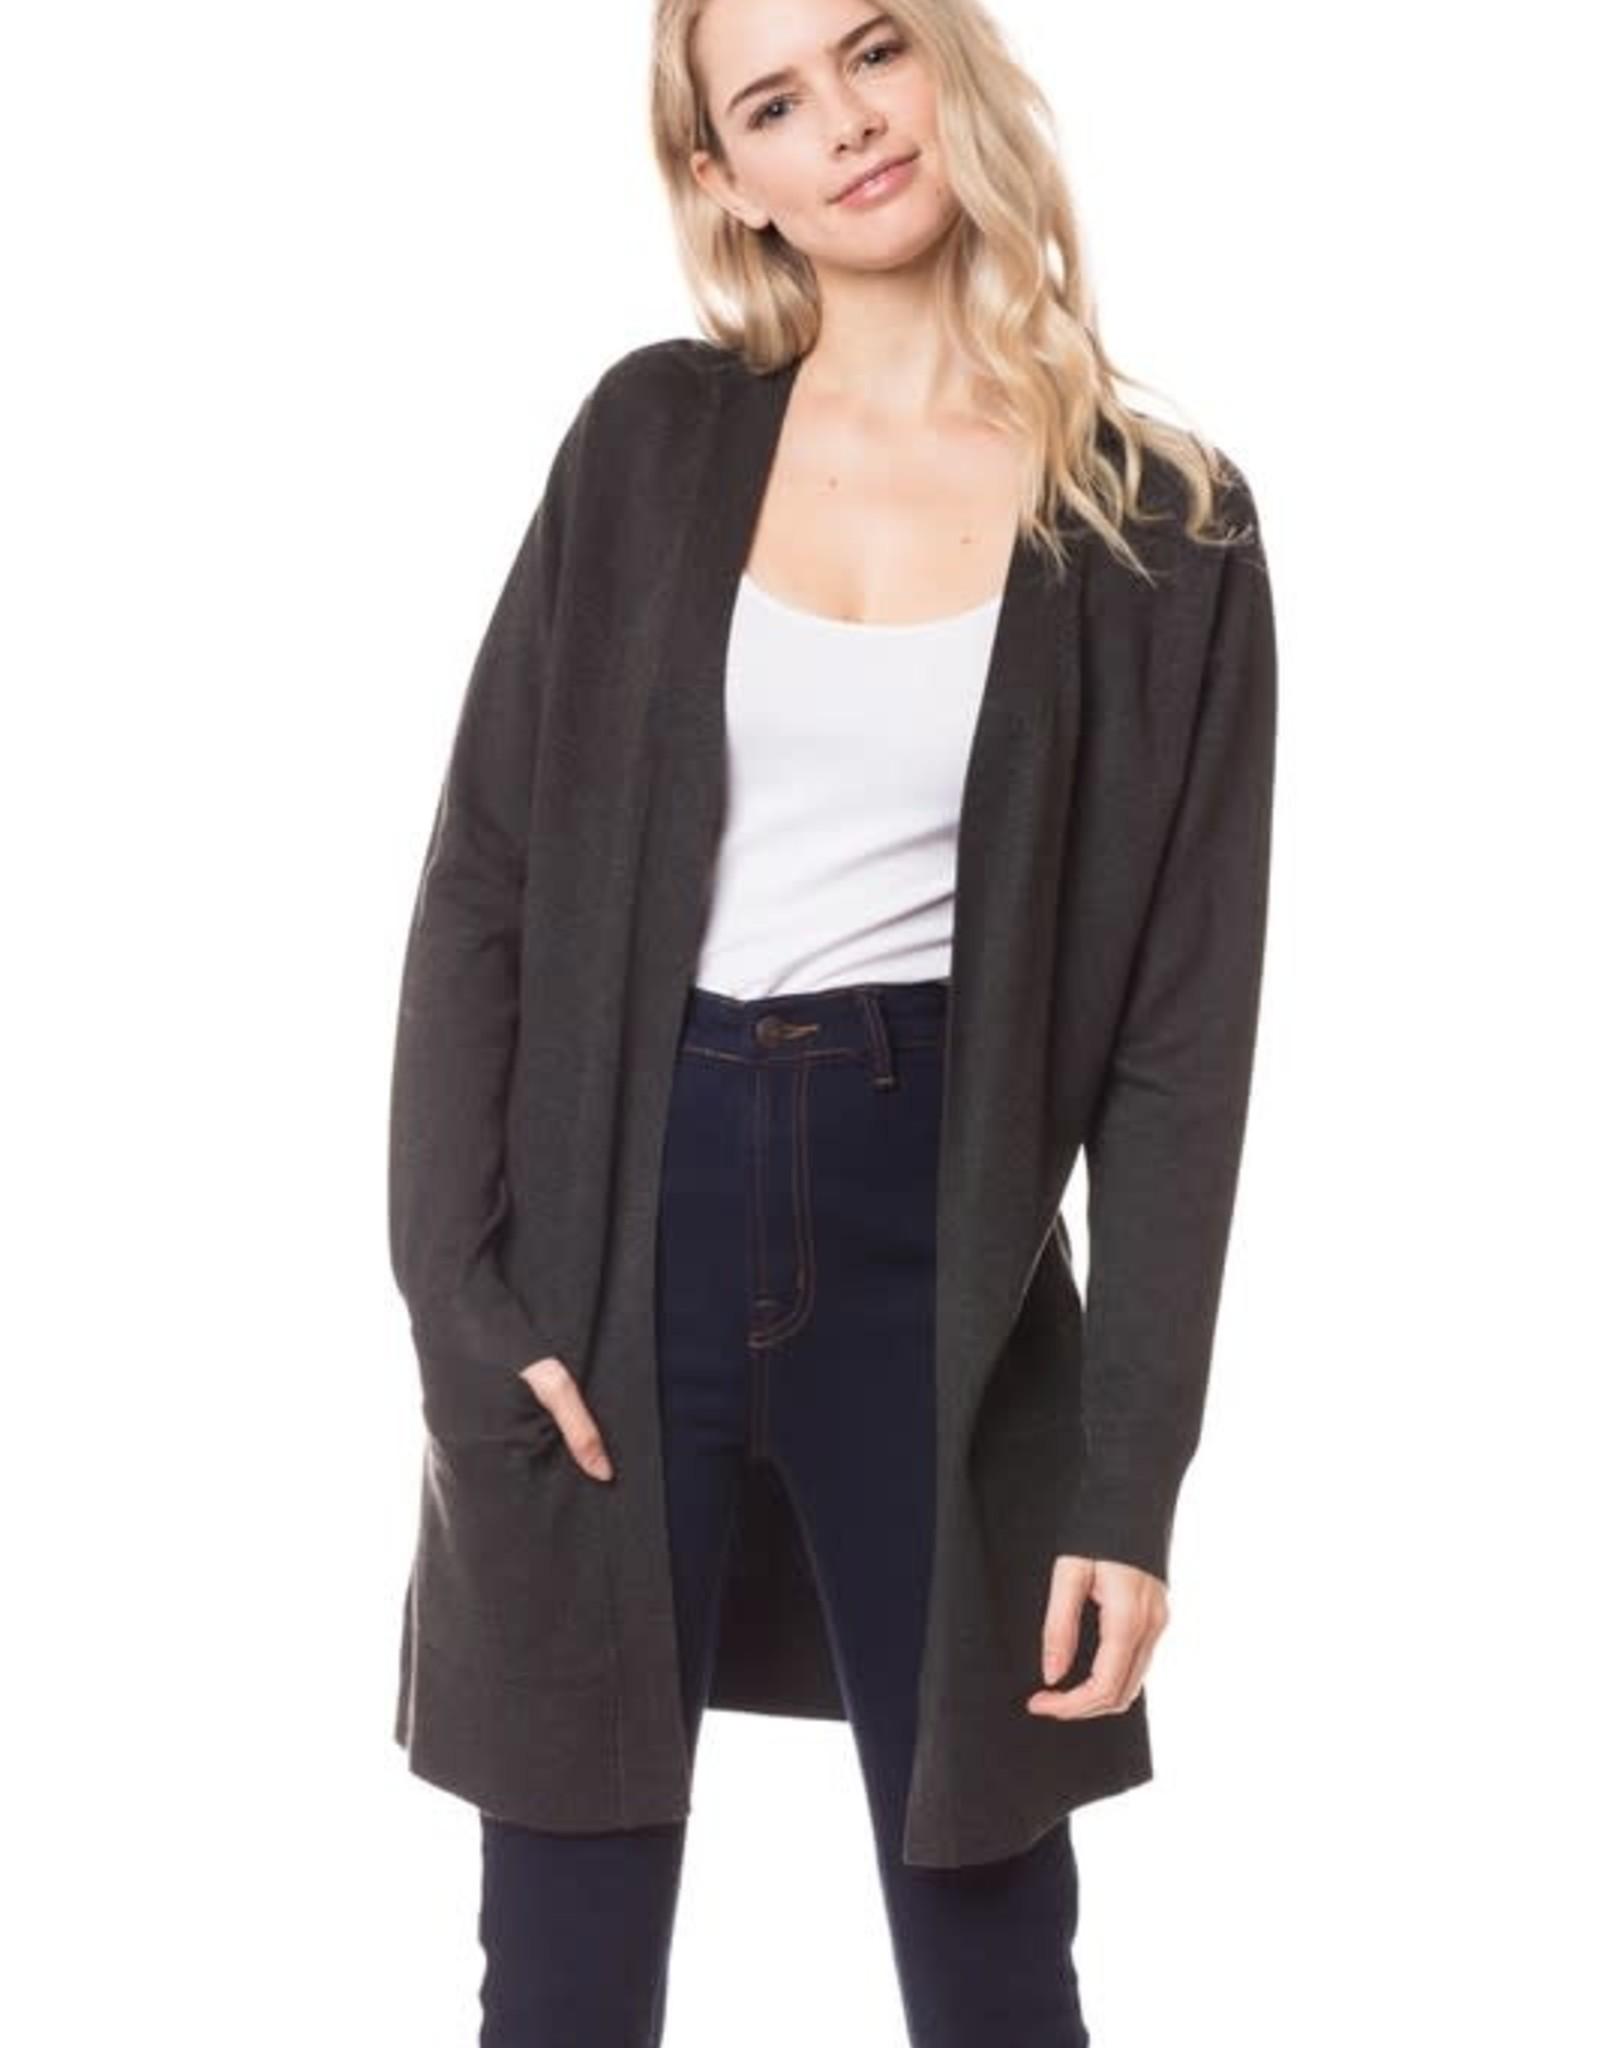 - Charcoal Grey Open Long Knit Cardigan w/Pockets